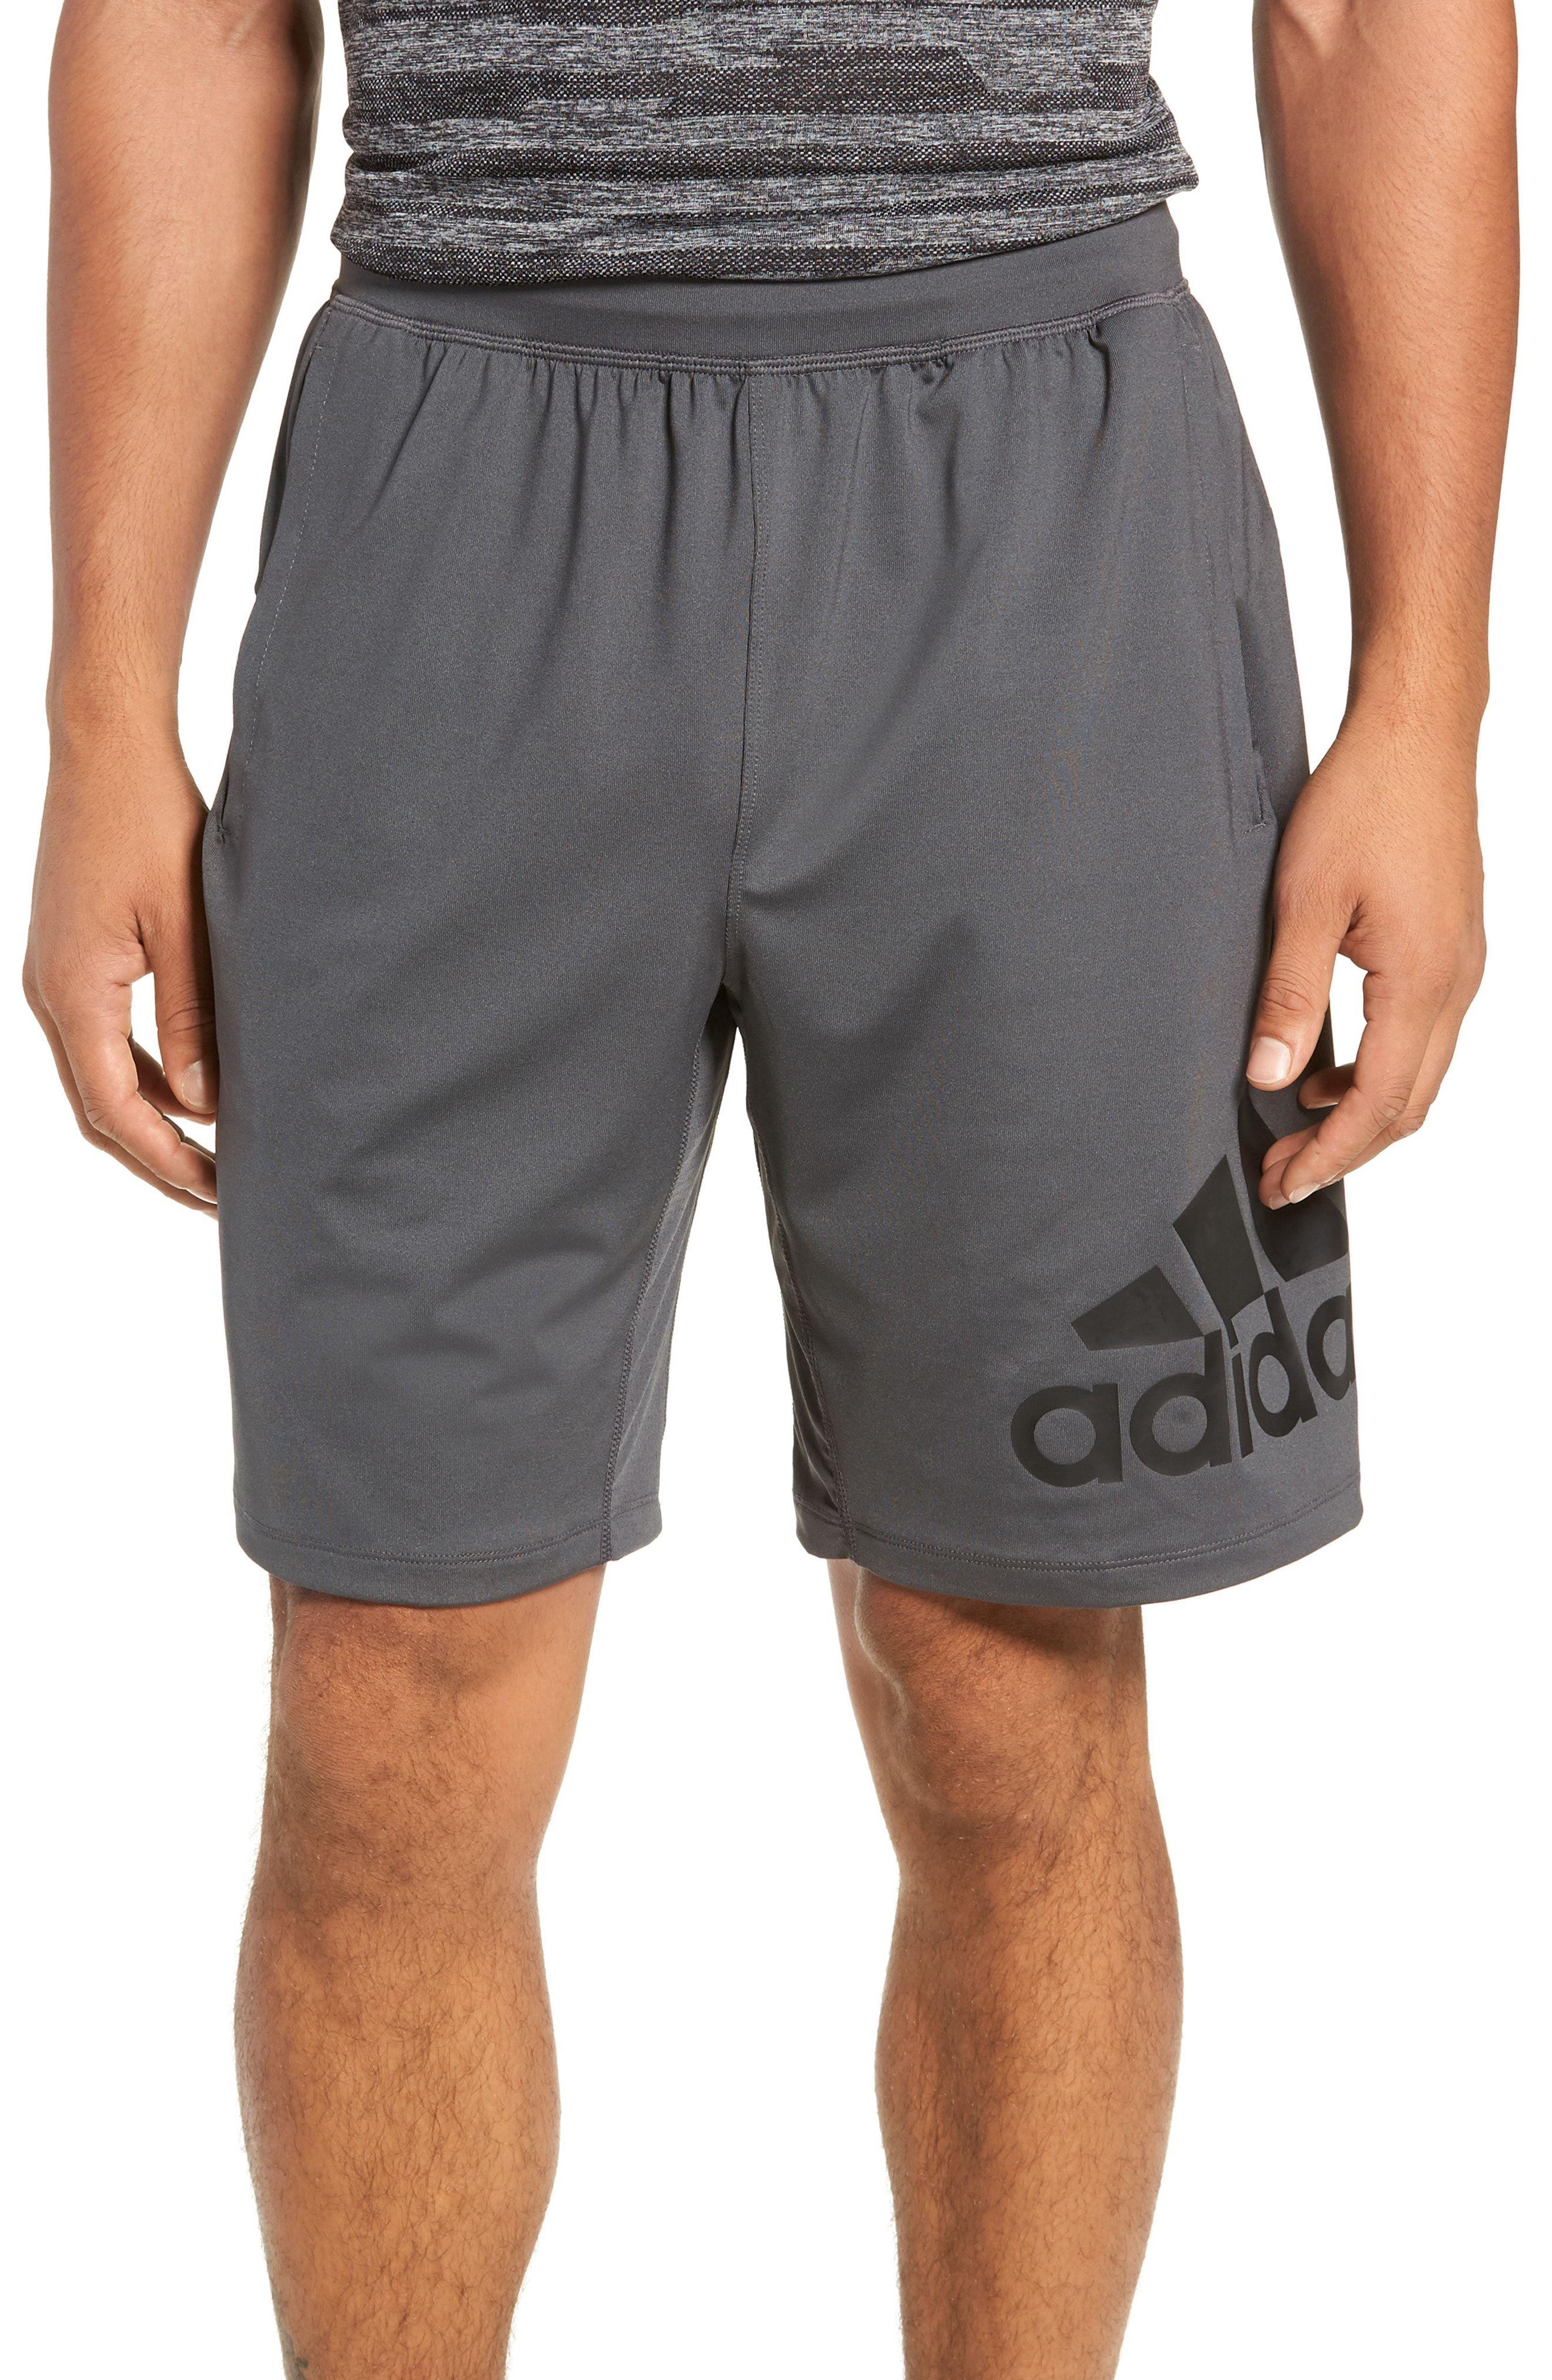 40d71db0a ADIDAS ORIGINALS 4KRFT SPORT BADGE CLIMALITE SHORTS. #adidasoriginals #cloth